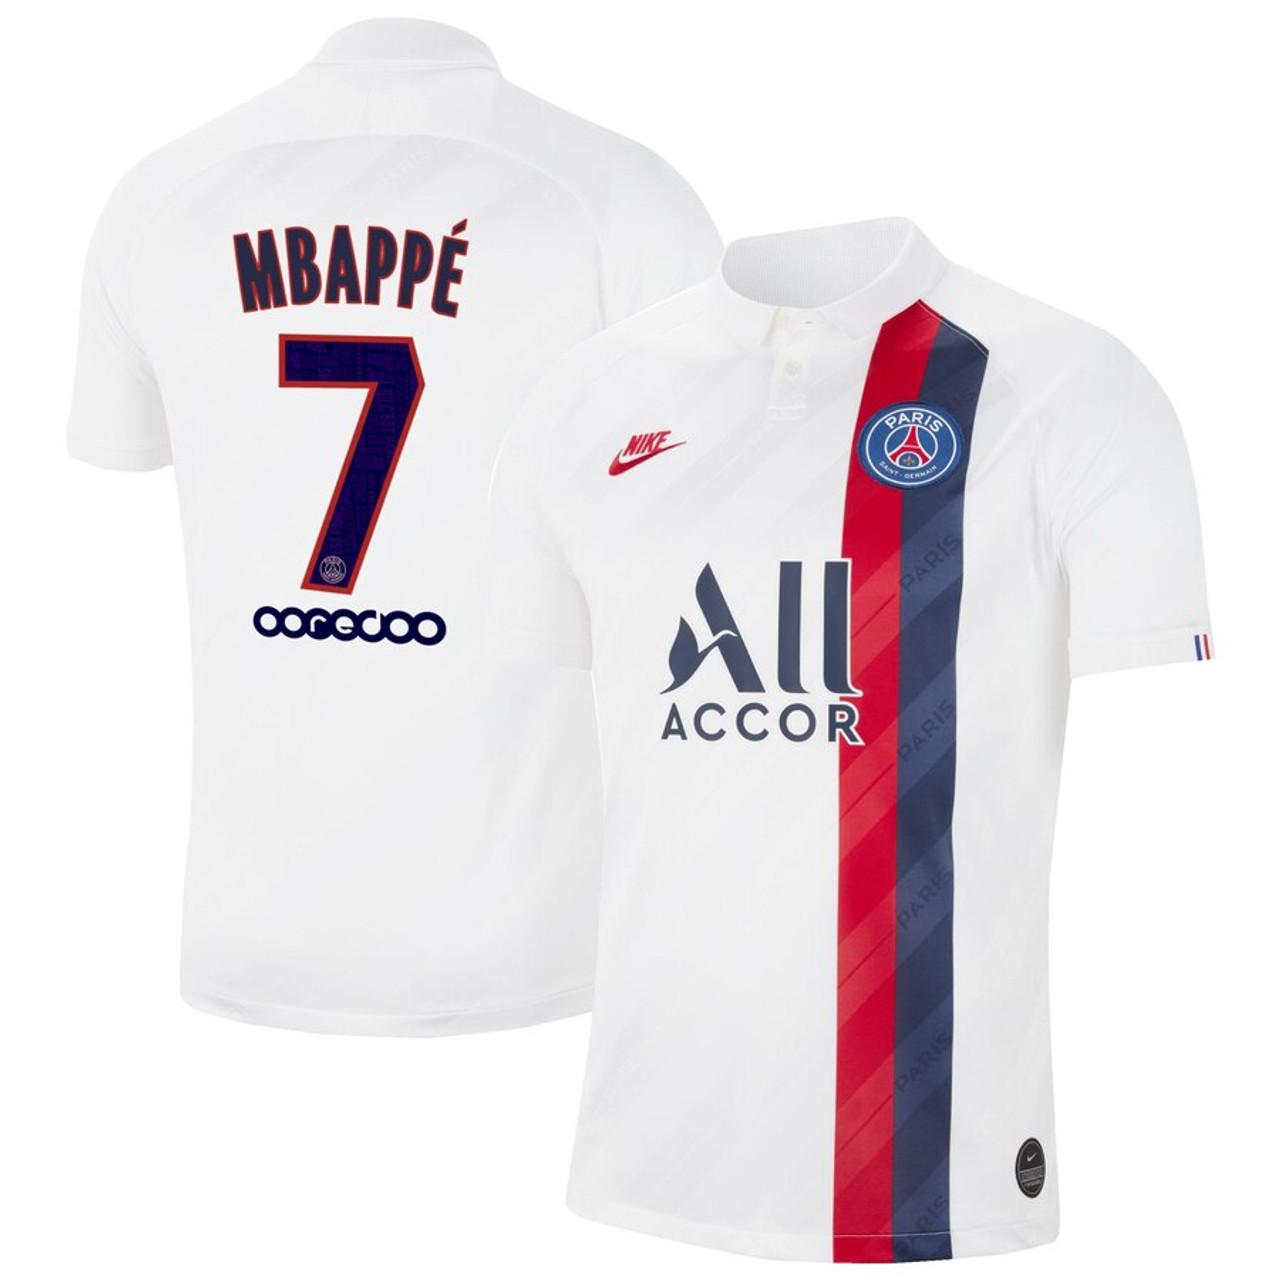 Nike Paris Saint Germain 2020 Mpappe Third Jersey Soccer Plus